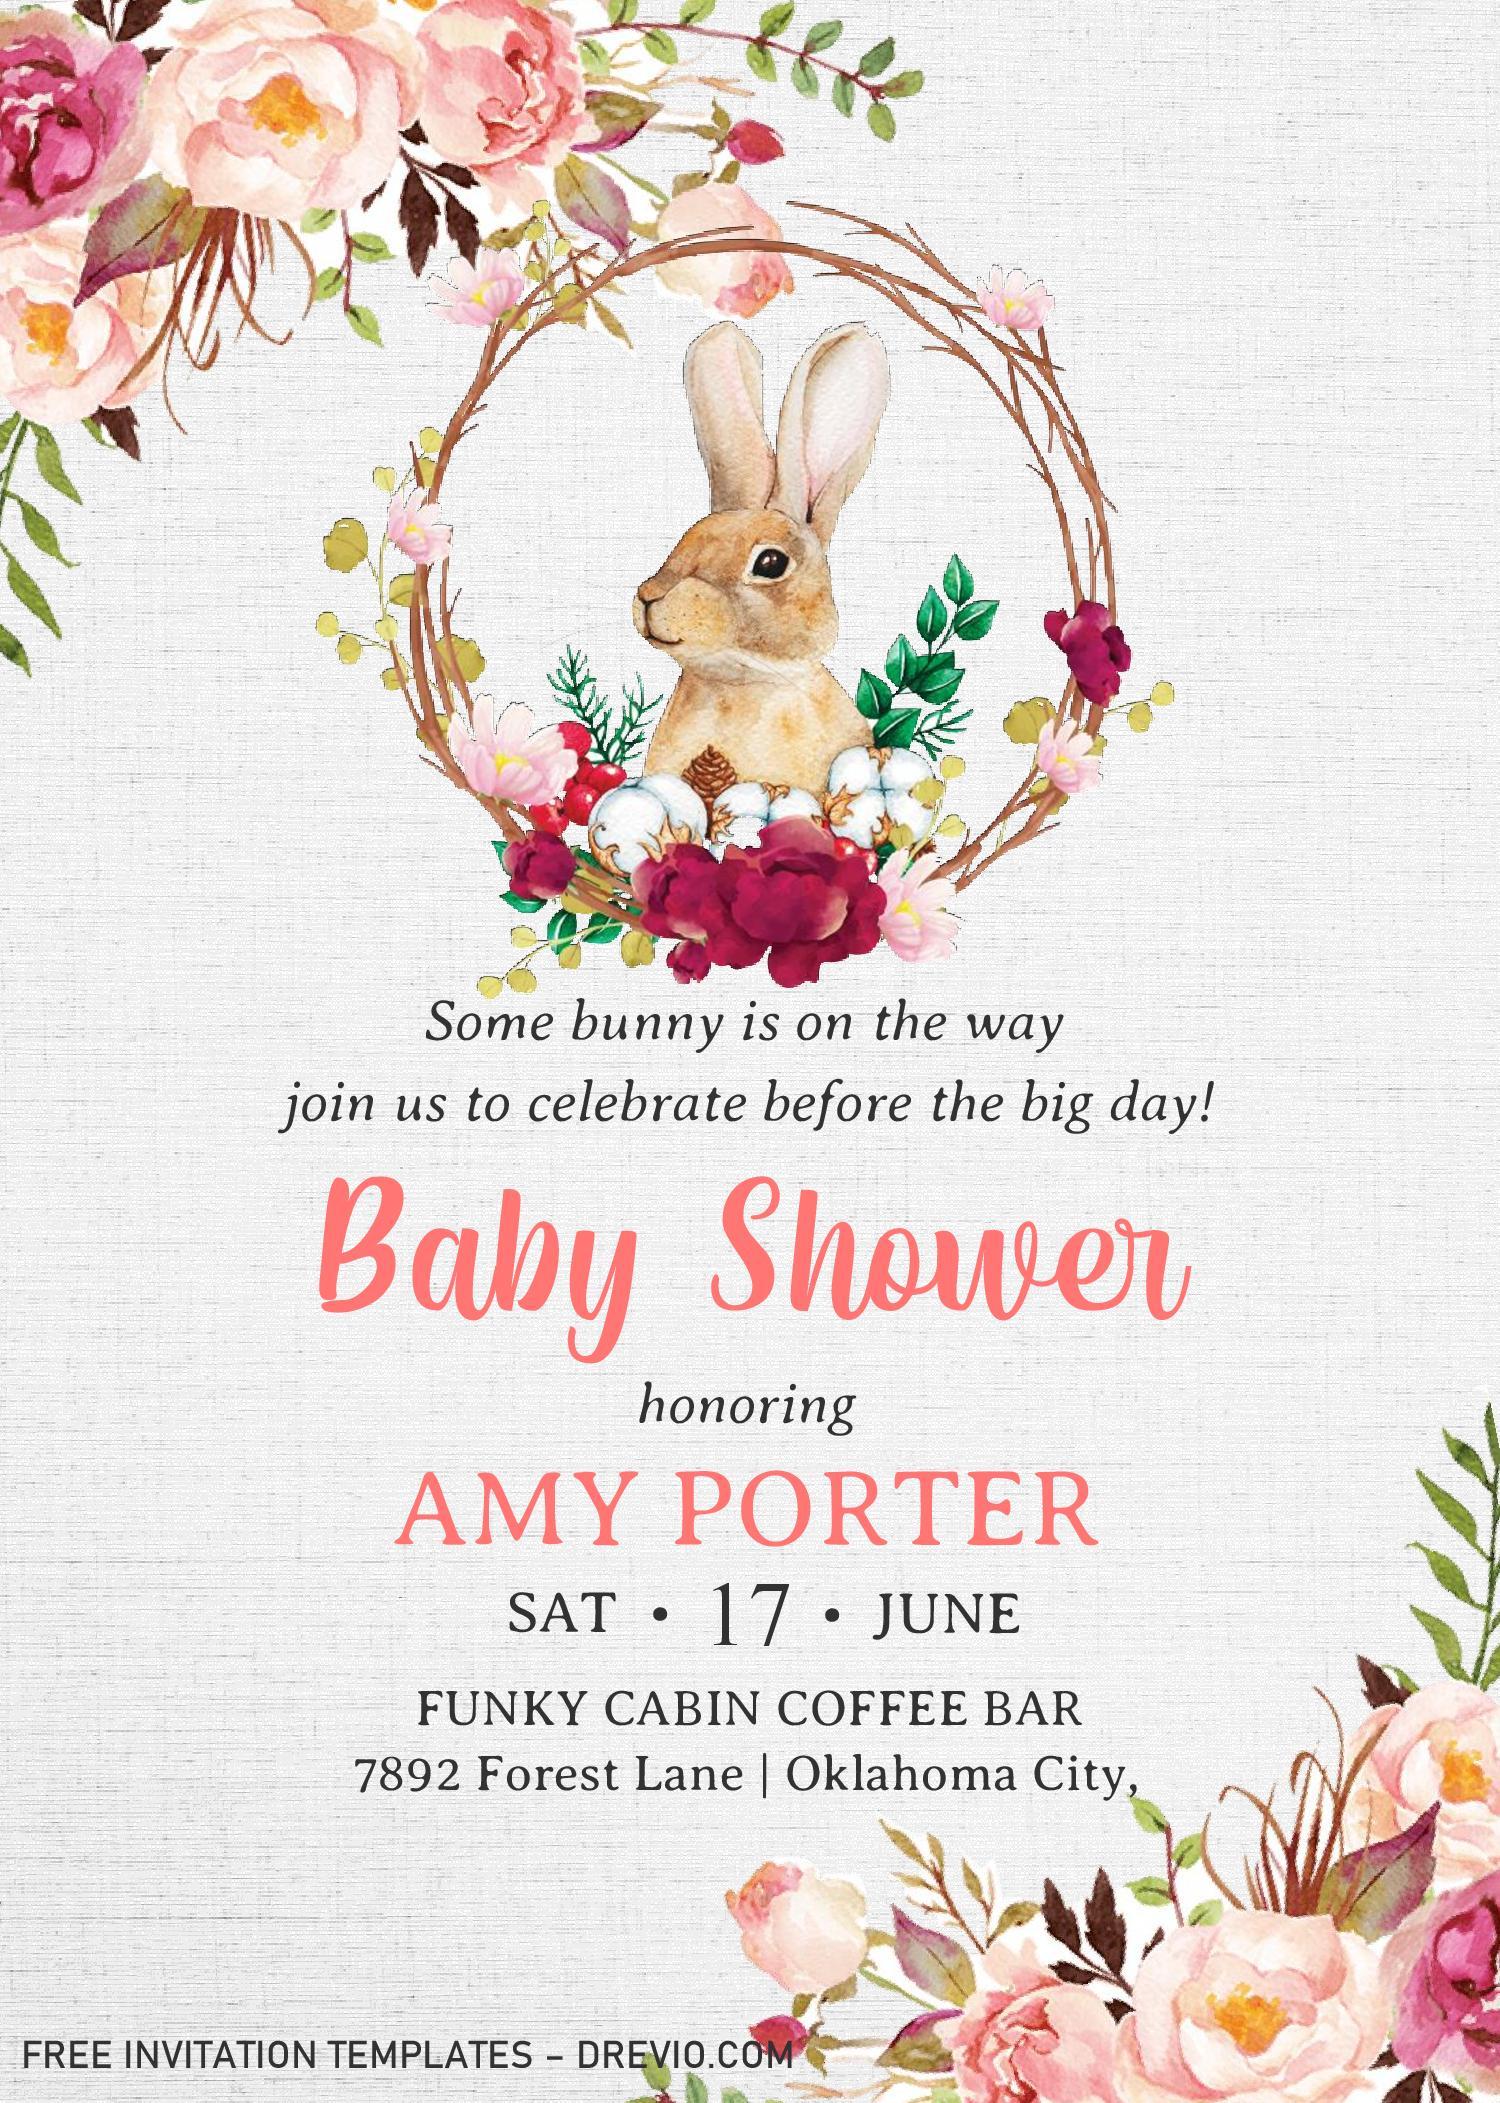 some bunny invitation templates